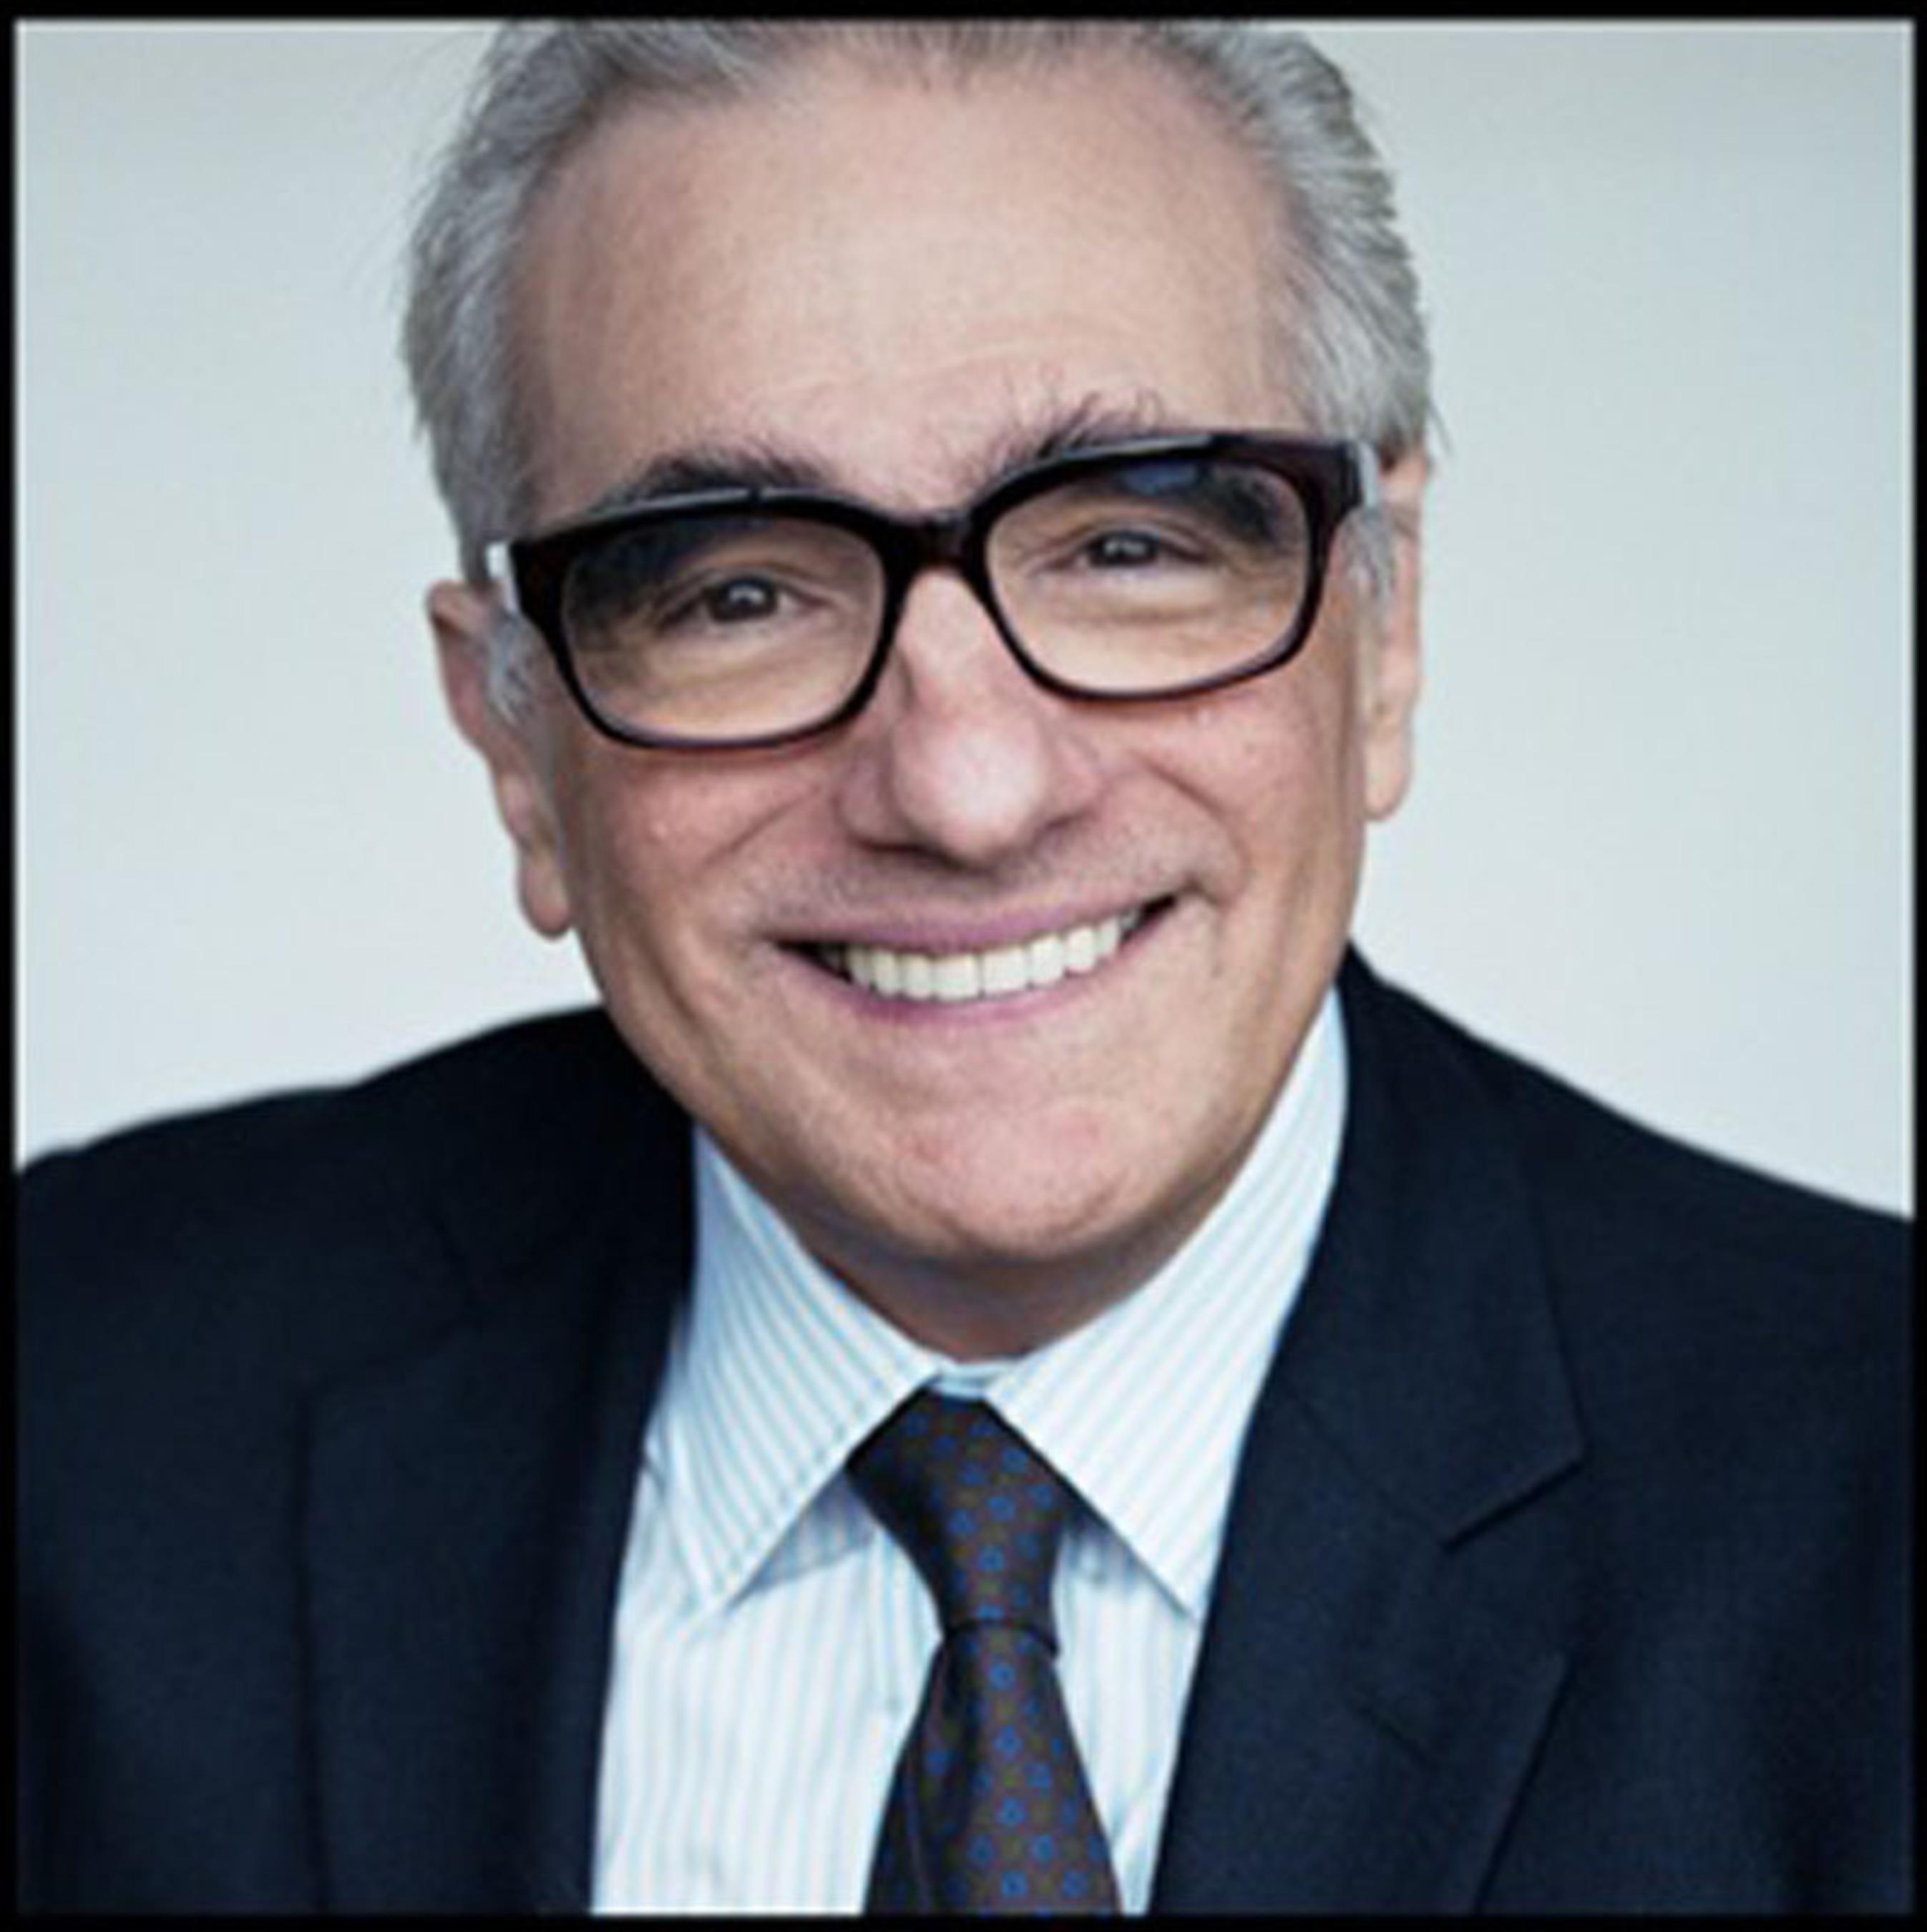 Martin Scorsese.  (PRNewsFoto/Art Directors Guild)